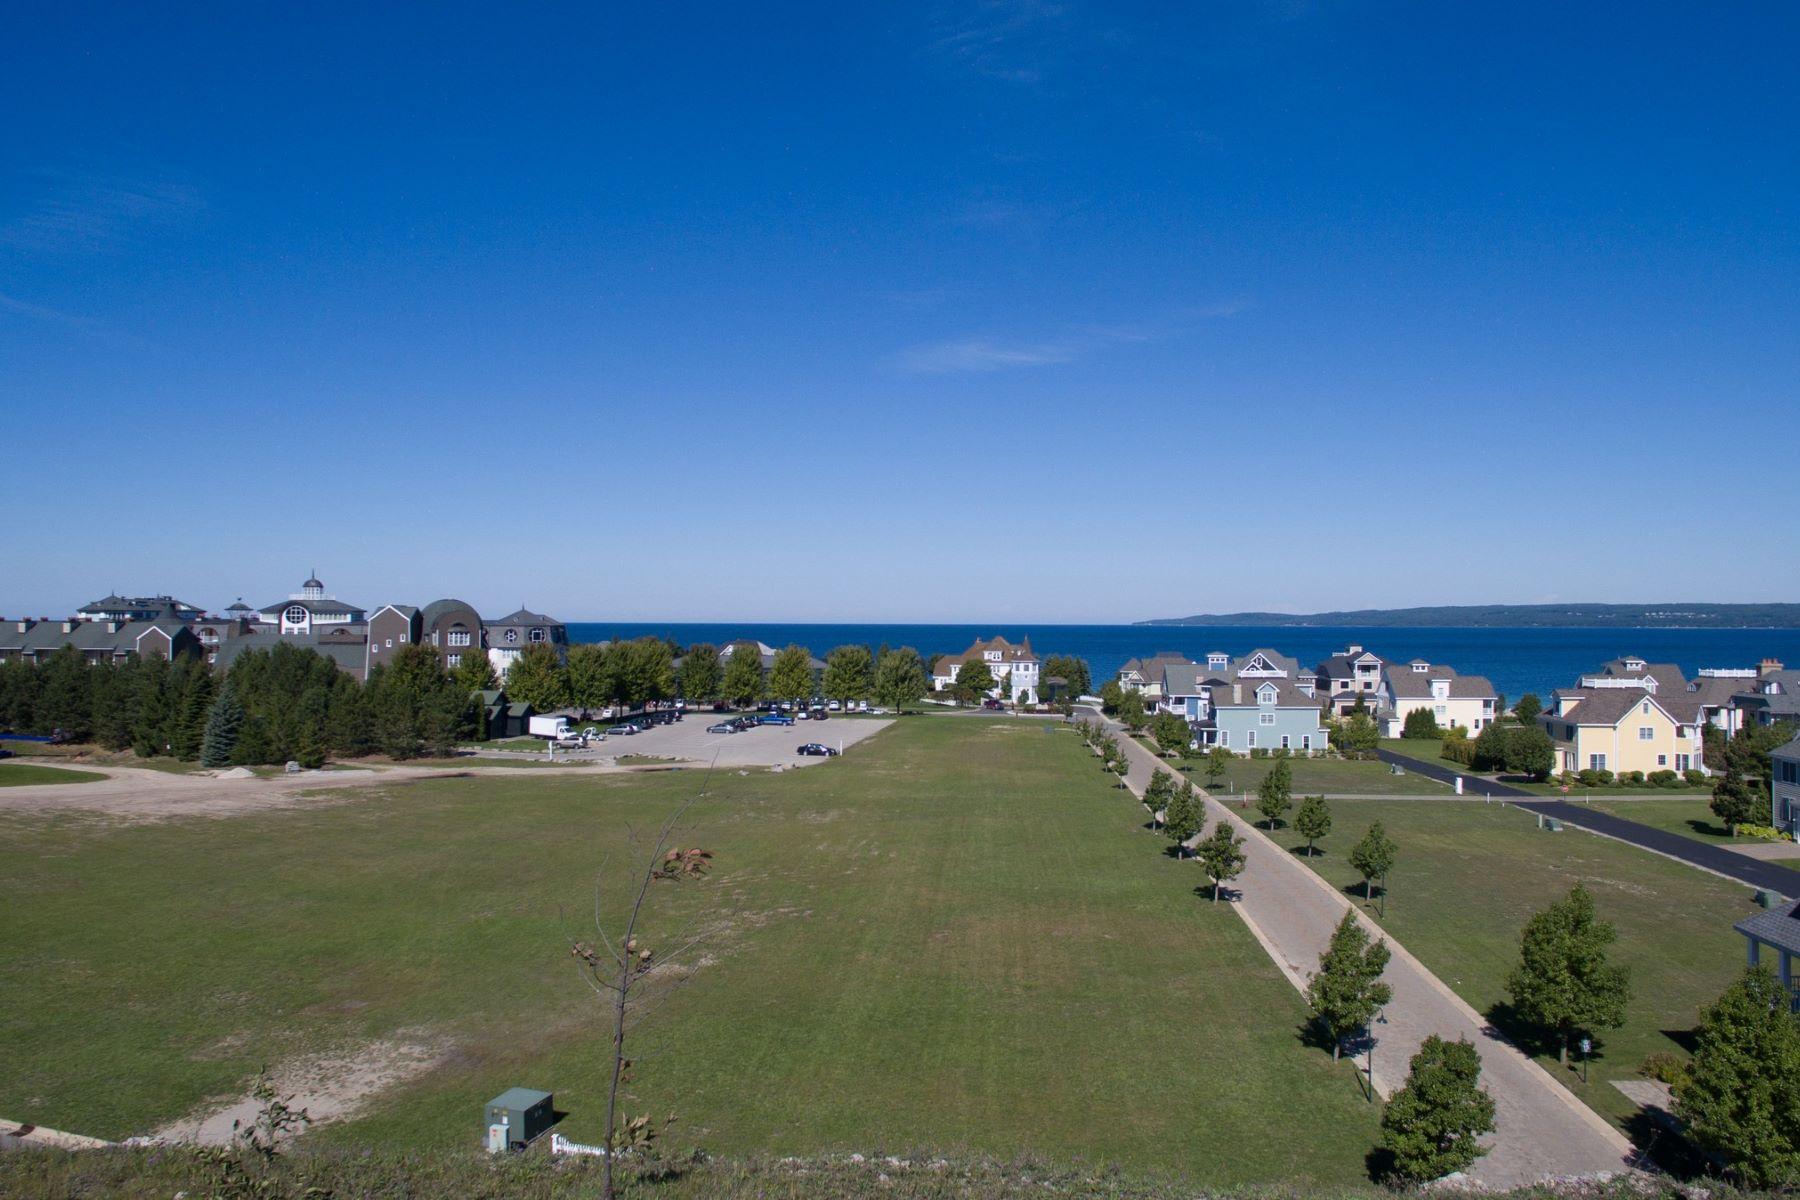 Land for Sale at Unit 9, The Ridge TBD Cliffs Drive, Unit 9, The Ridge Bay Harbor, Michigan 49770 United States